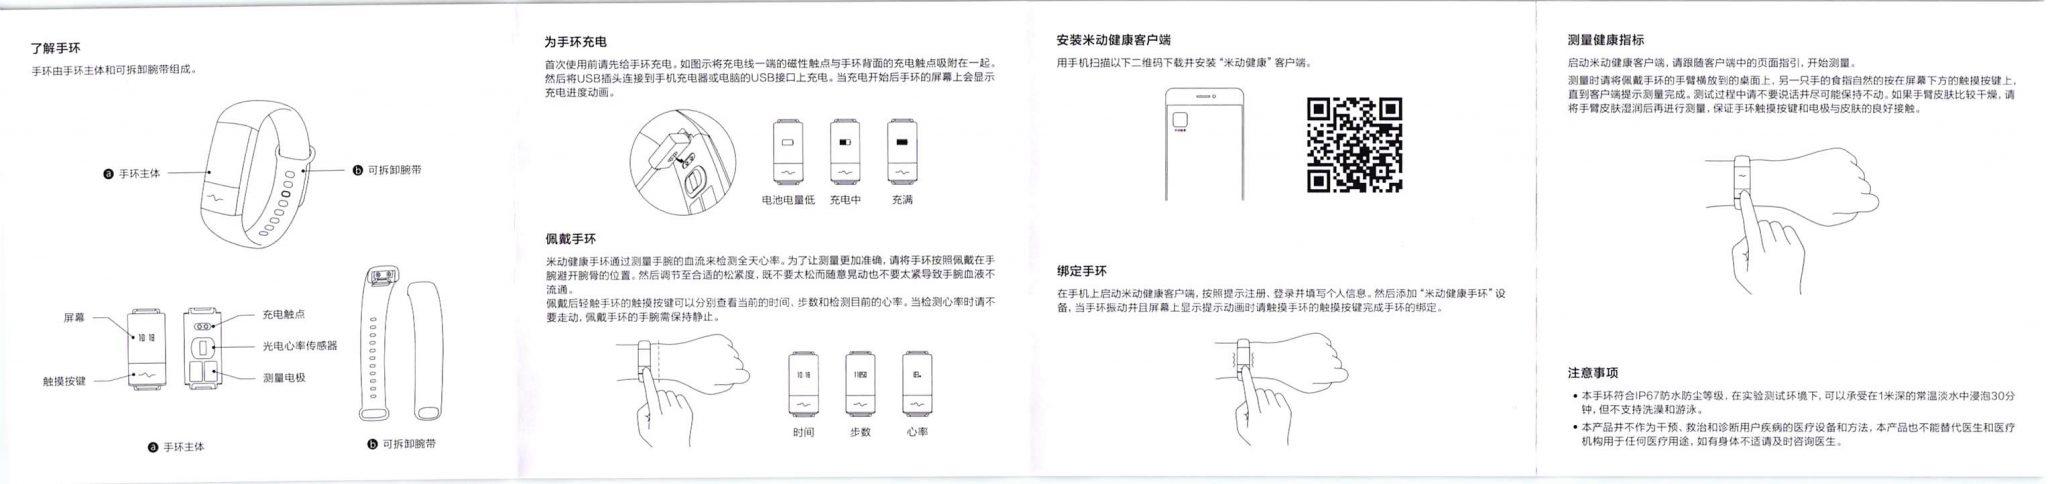 Xiaomi AMAZFIT ハートレート スマートバンド 取説2